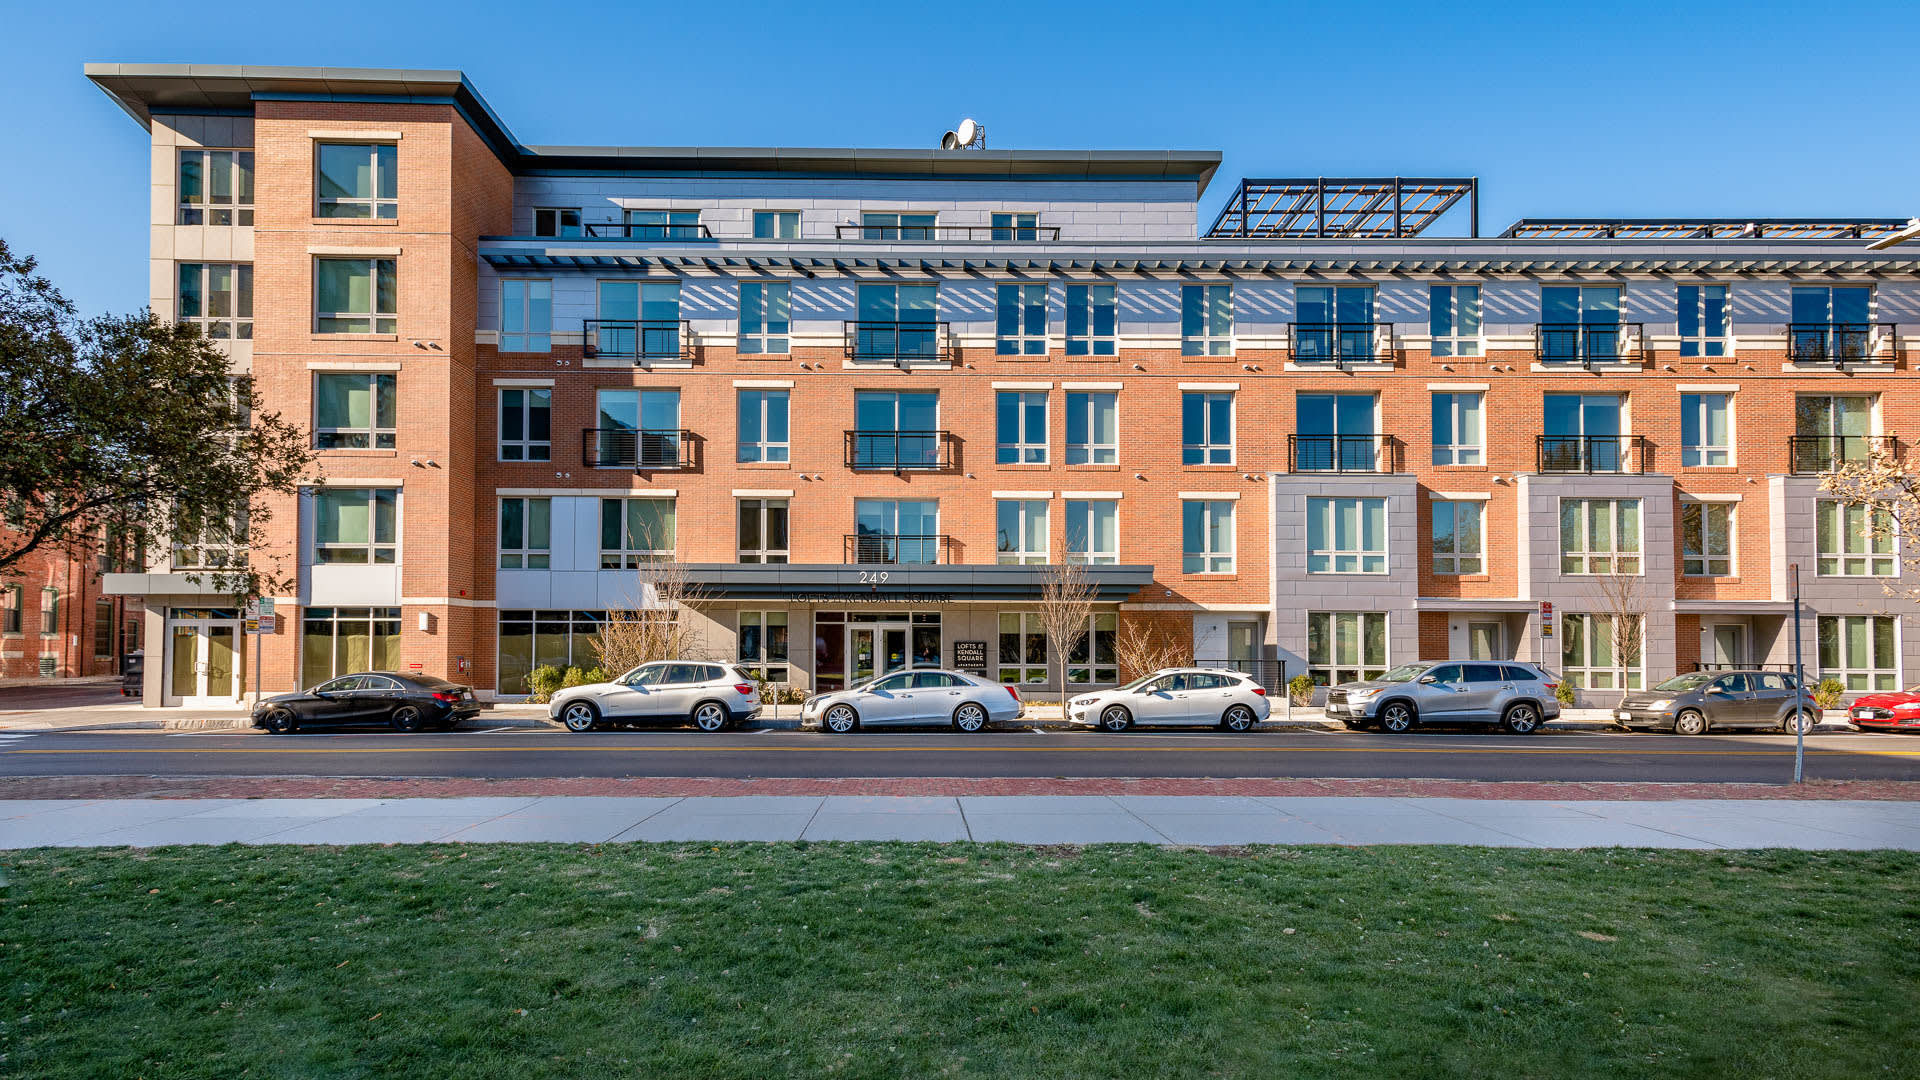 Lofts at Kendall Square Apartments - Exterior